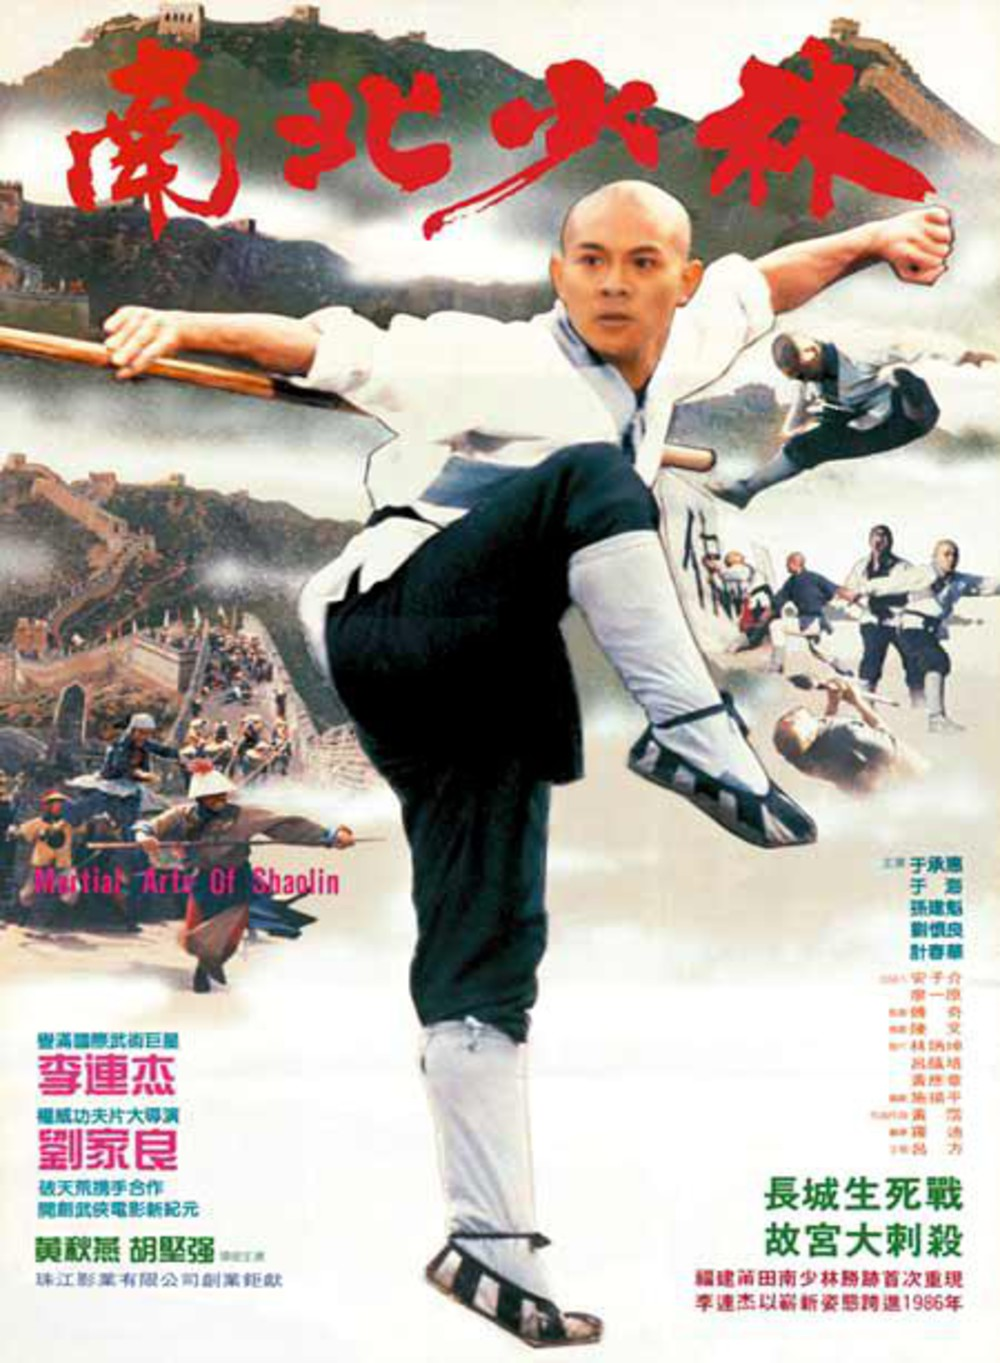 The Shaolin Temple Martial Art of Shaolin (1986) เสี้ยวลิ้มยี่ ภาค 3 มังกรน่ำปั๊ก